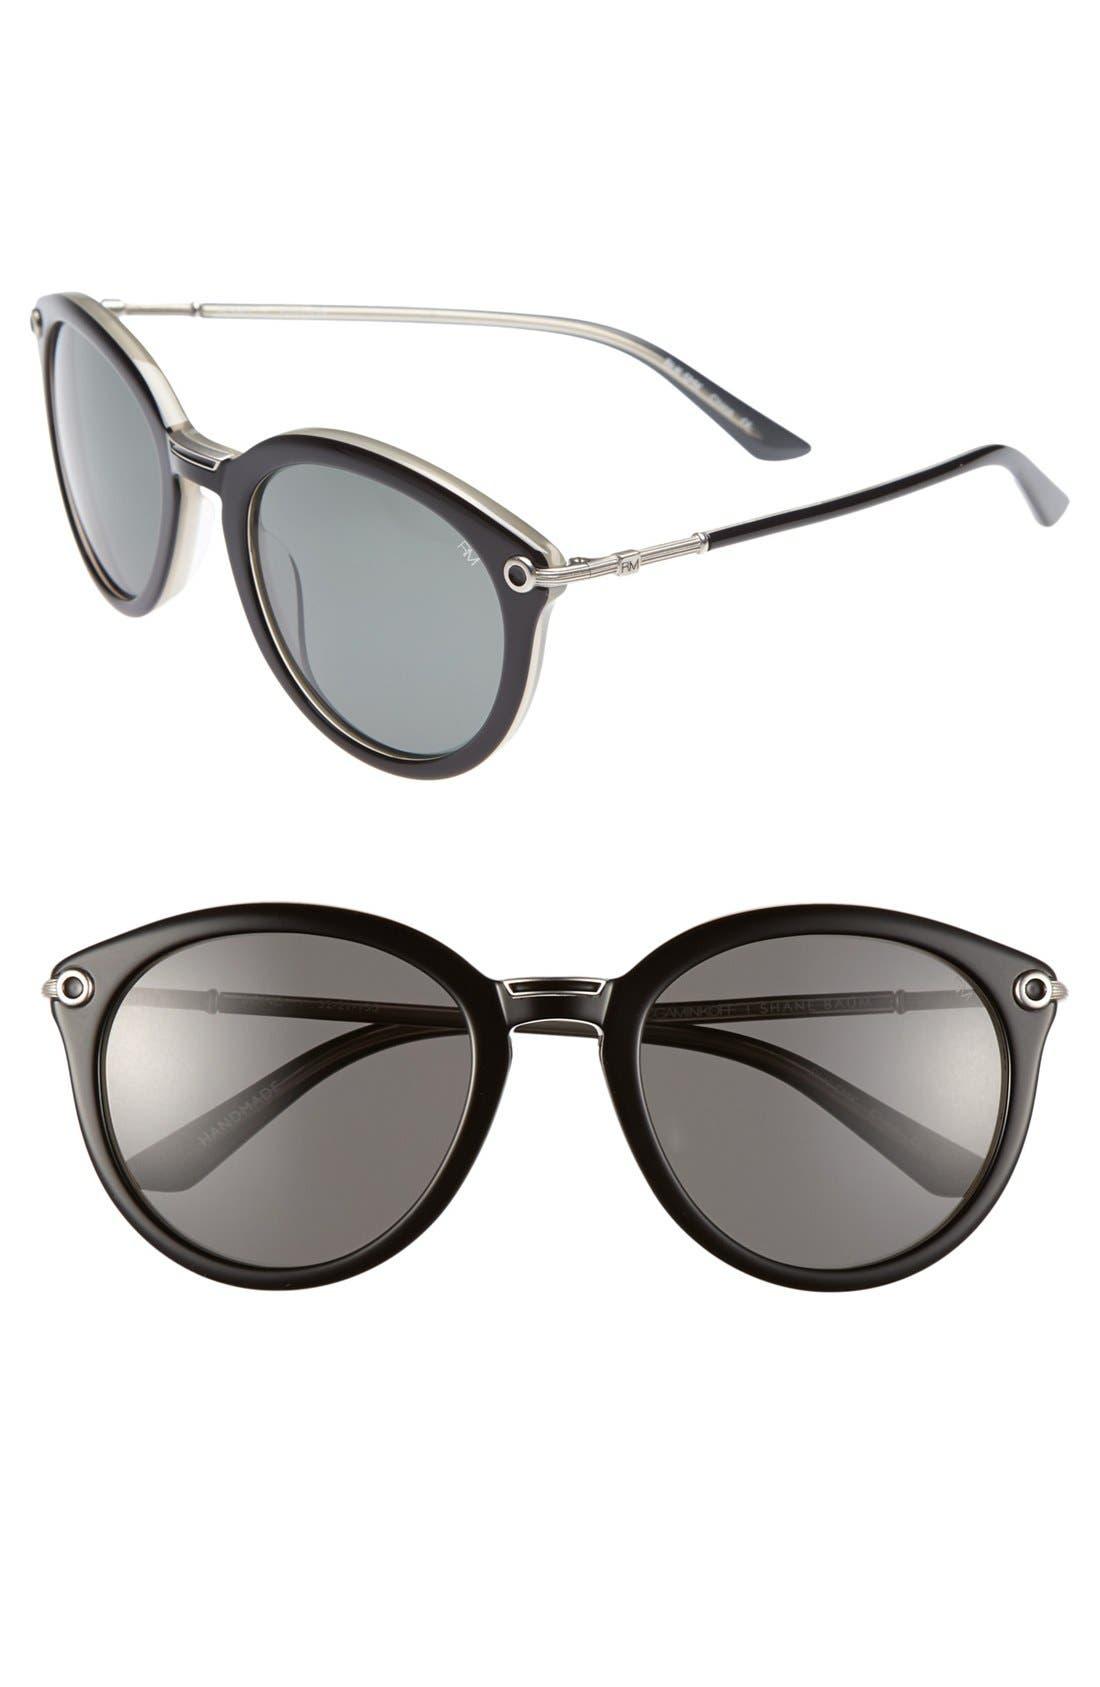 Main Image - Rebecca Minkoff 'Bond' 52mm Sunglasses